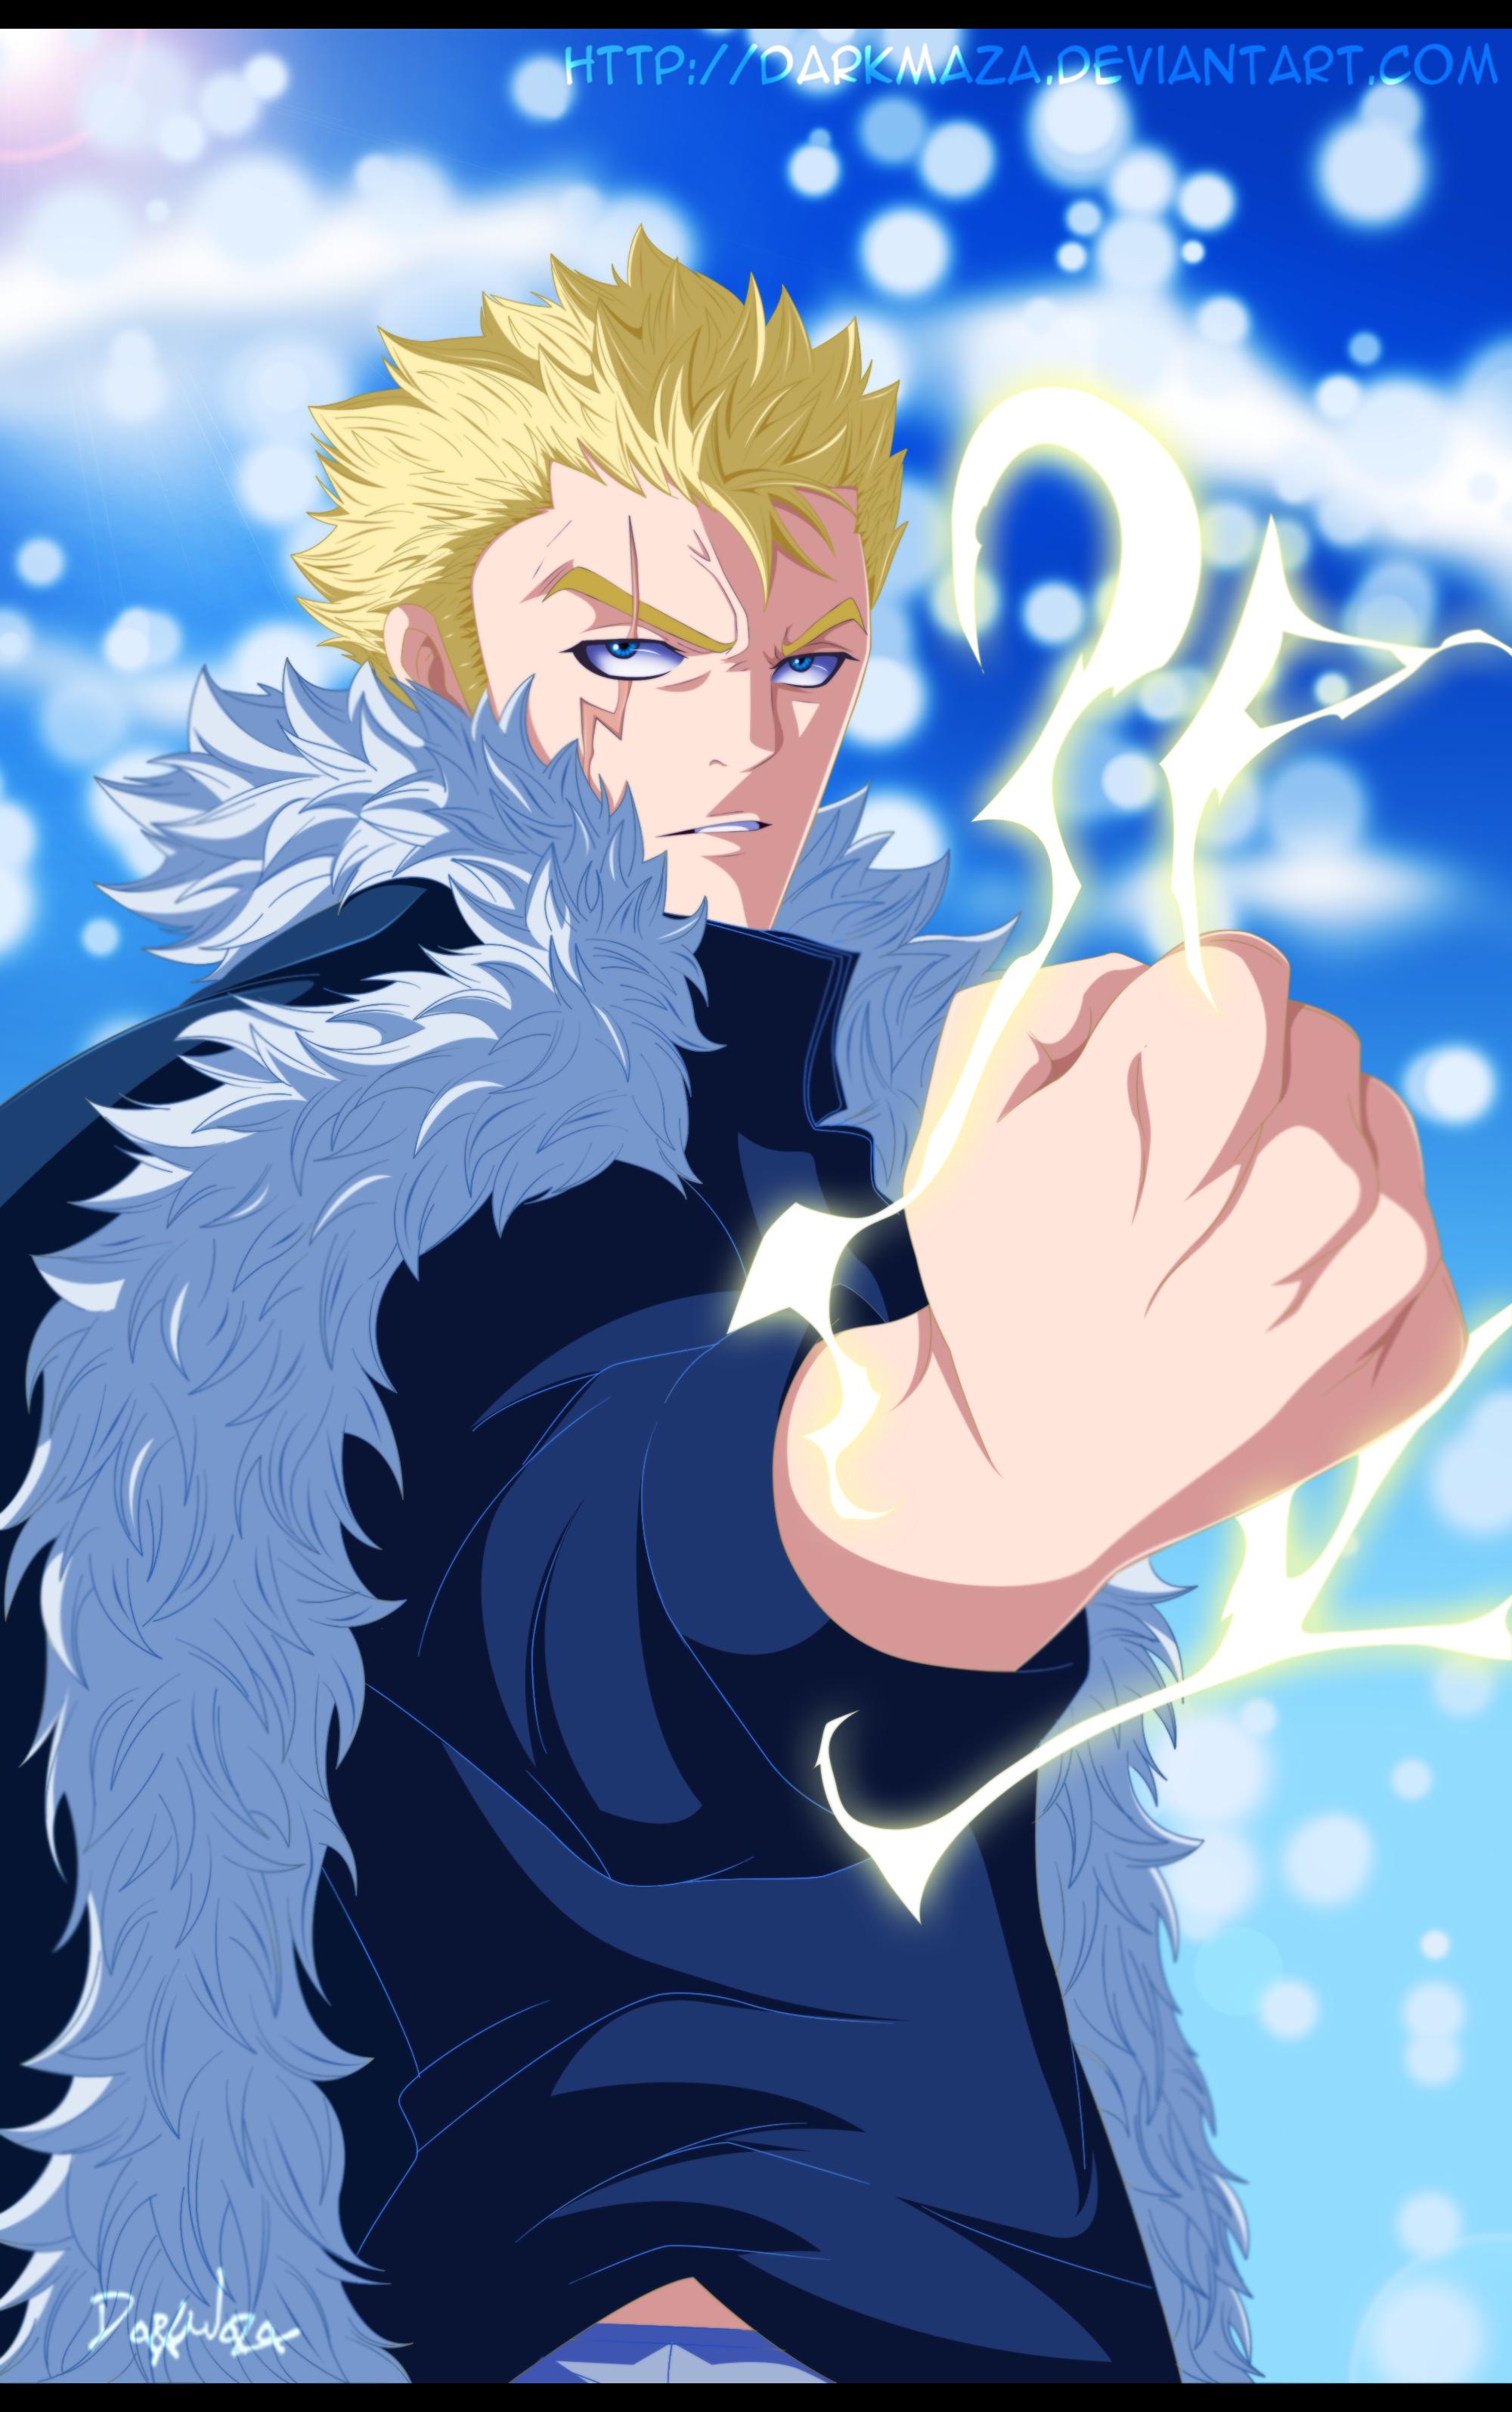 Fairy Tail 357~ Laxus Dreyar by DarkMaza